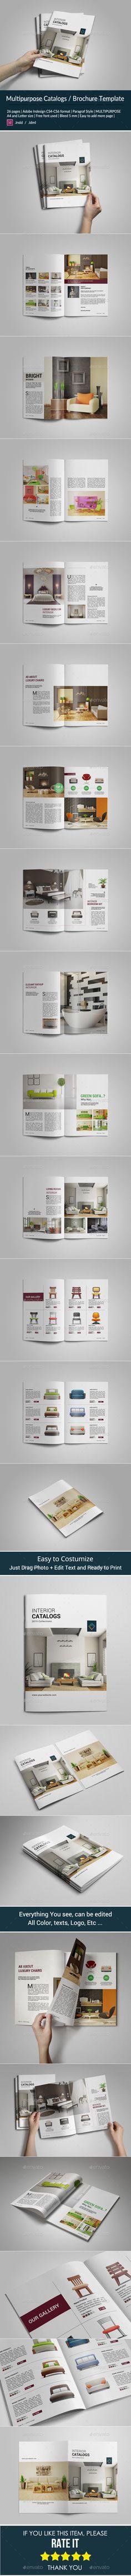 Multipurpose Catalogs / Brochure Template. Download: http://graphicriver.net/item/multipurpose-catalogs-brochure/9727534?ref=ksioks